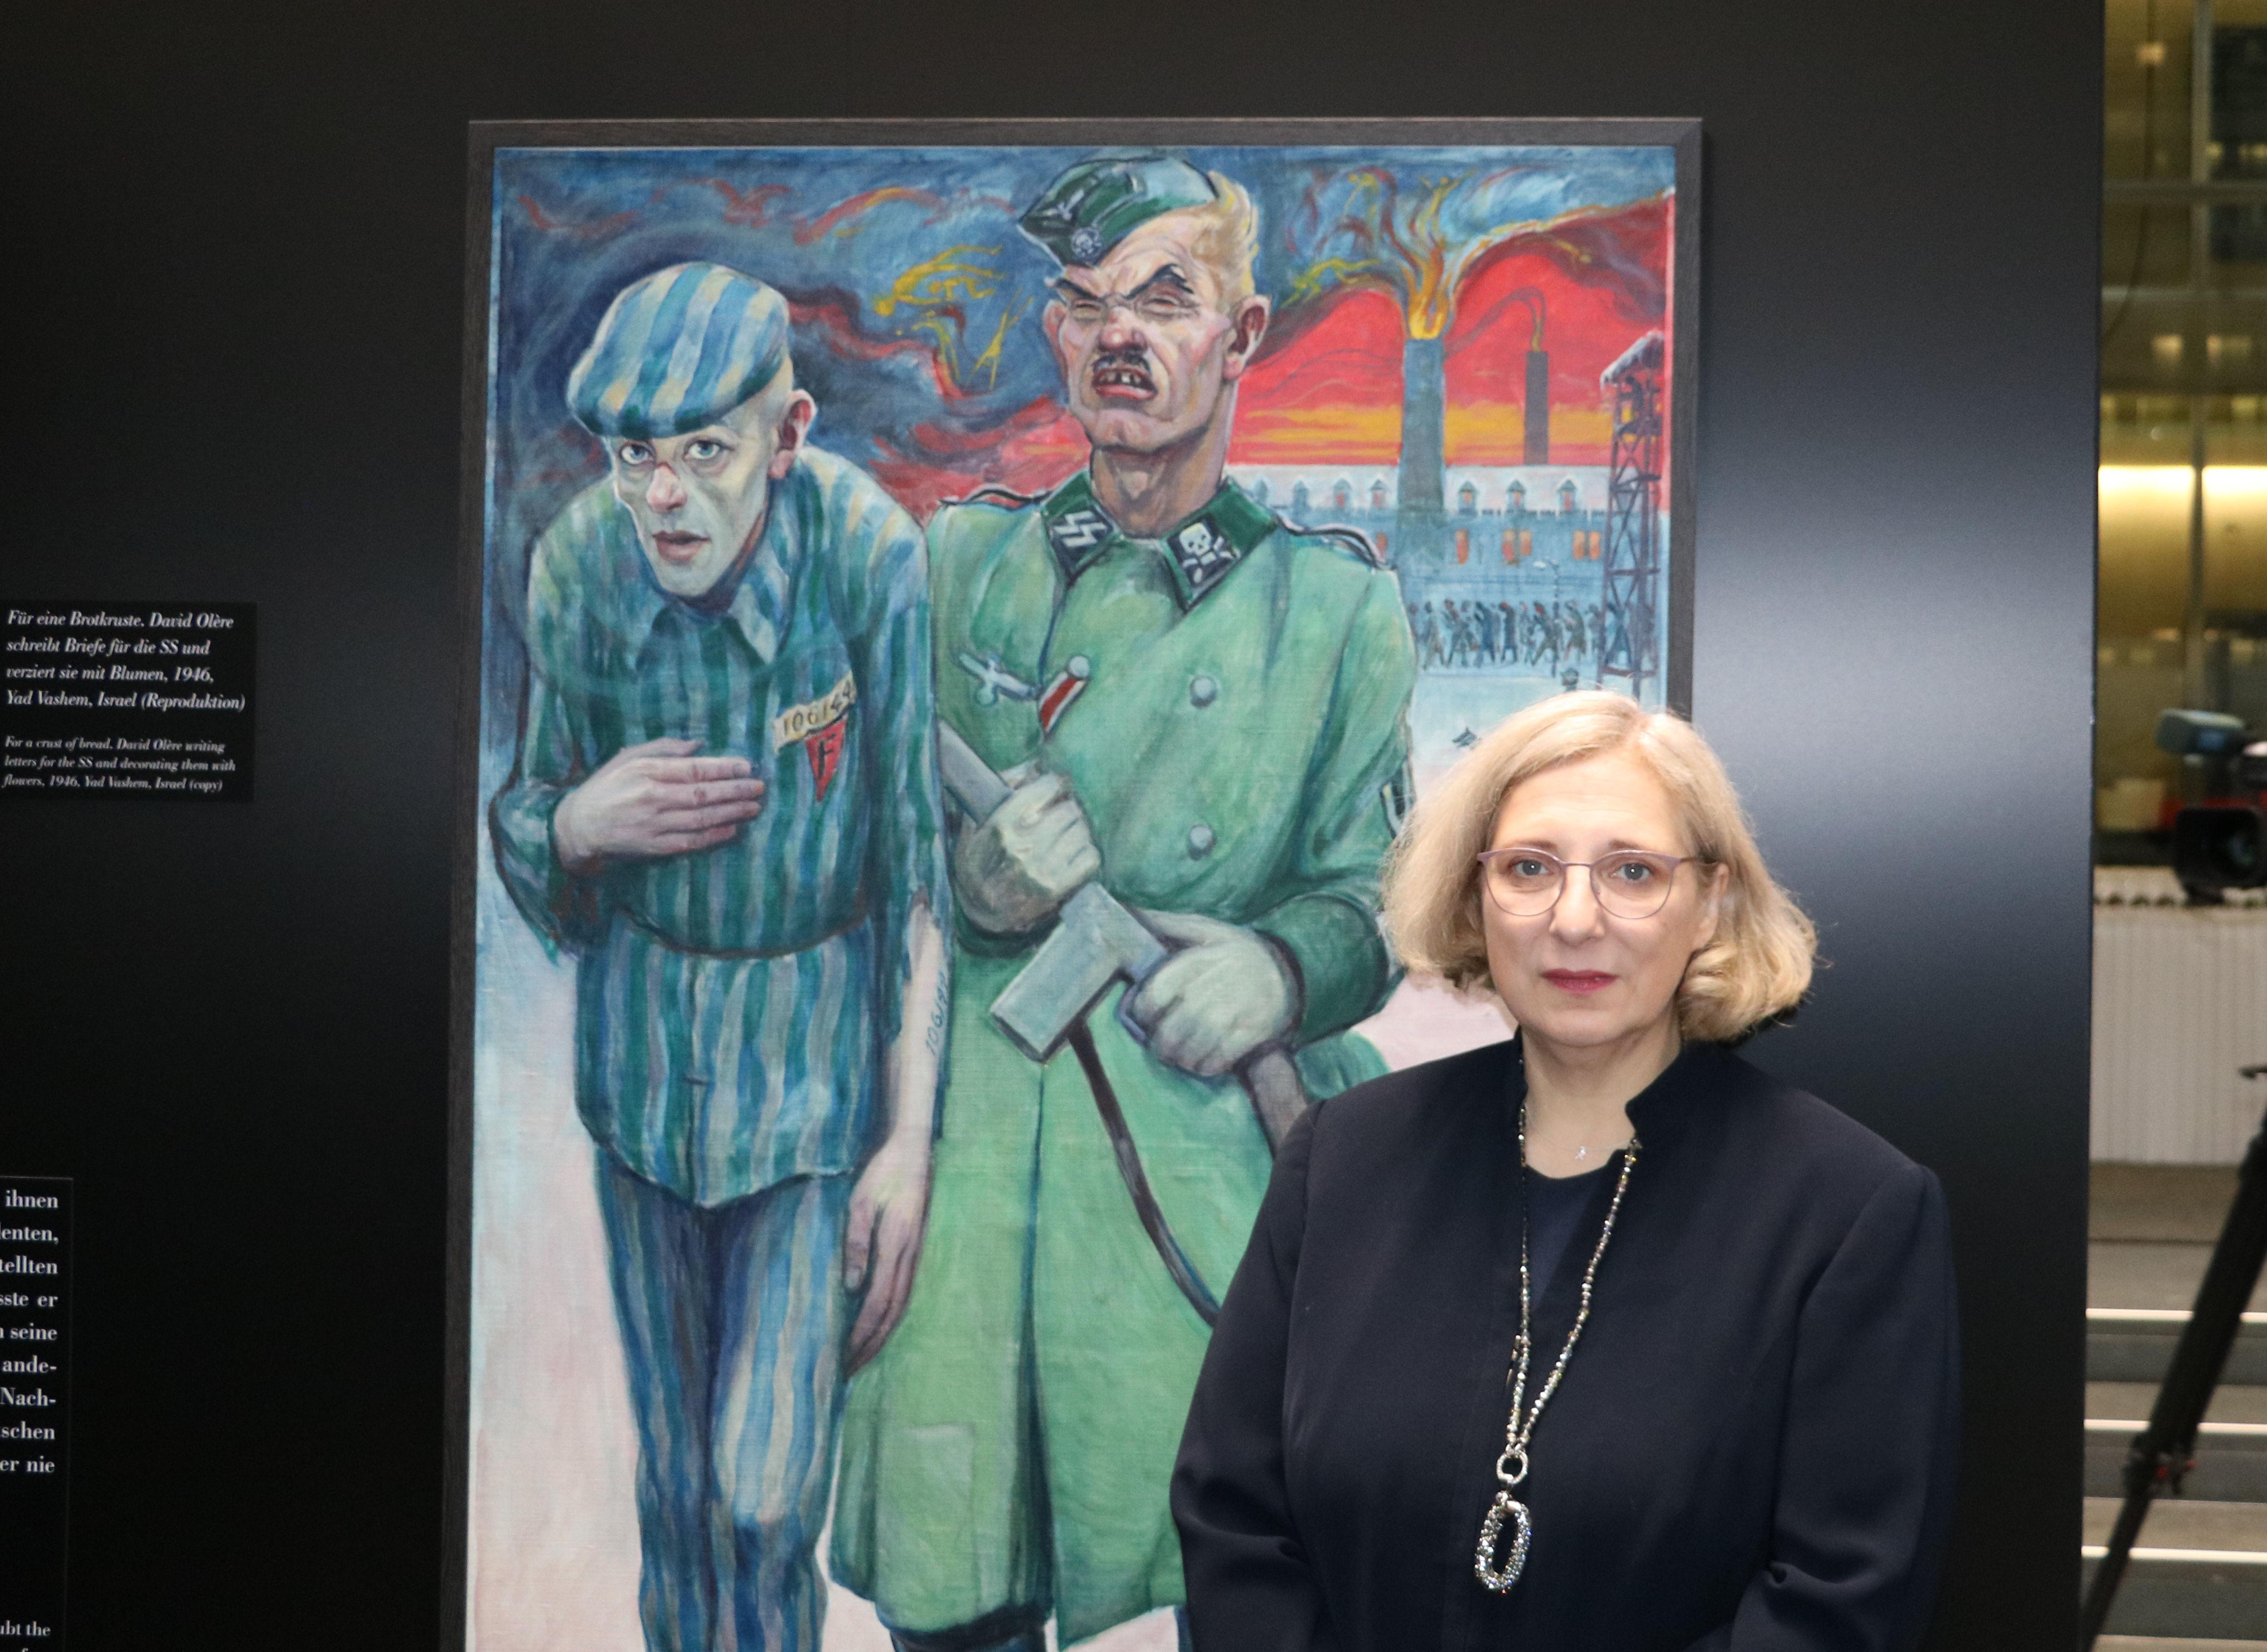 Dr. Daniela De Ridder bei der Ausstellungseröffnung zu David Olères Werken